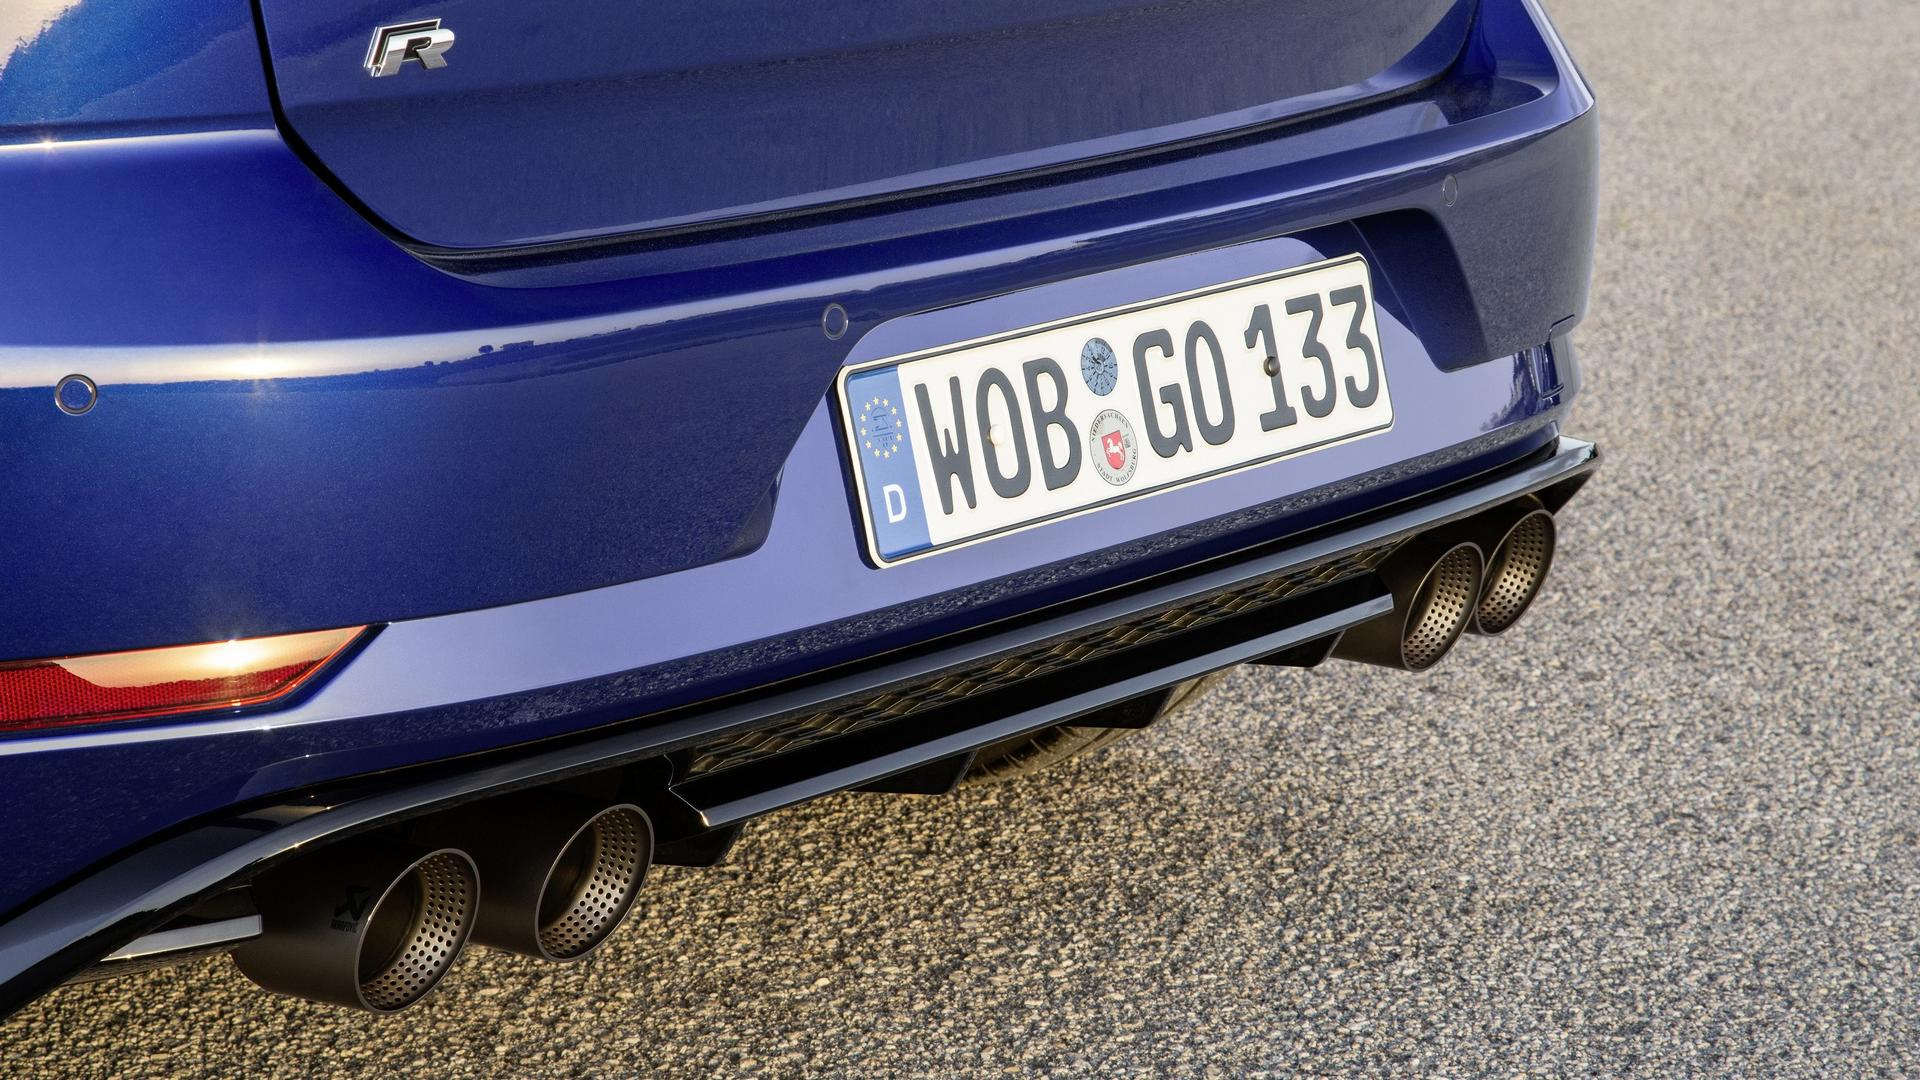 Vw Golf R Performance Pack Has Akrapovic Exhaust Lighter Brakes